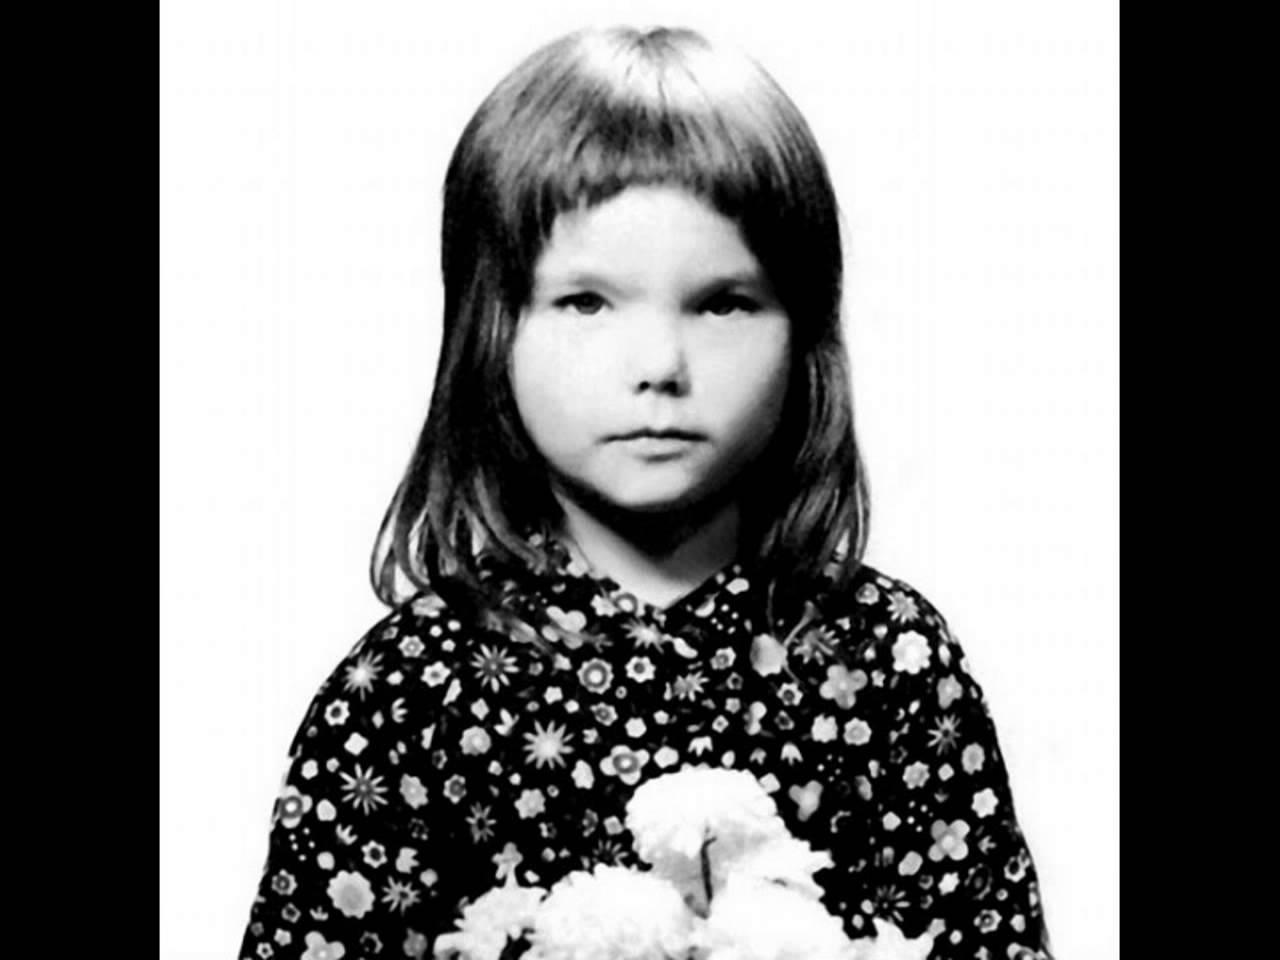 Björk childhood photo one at Youtube.com